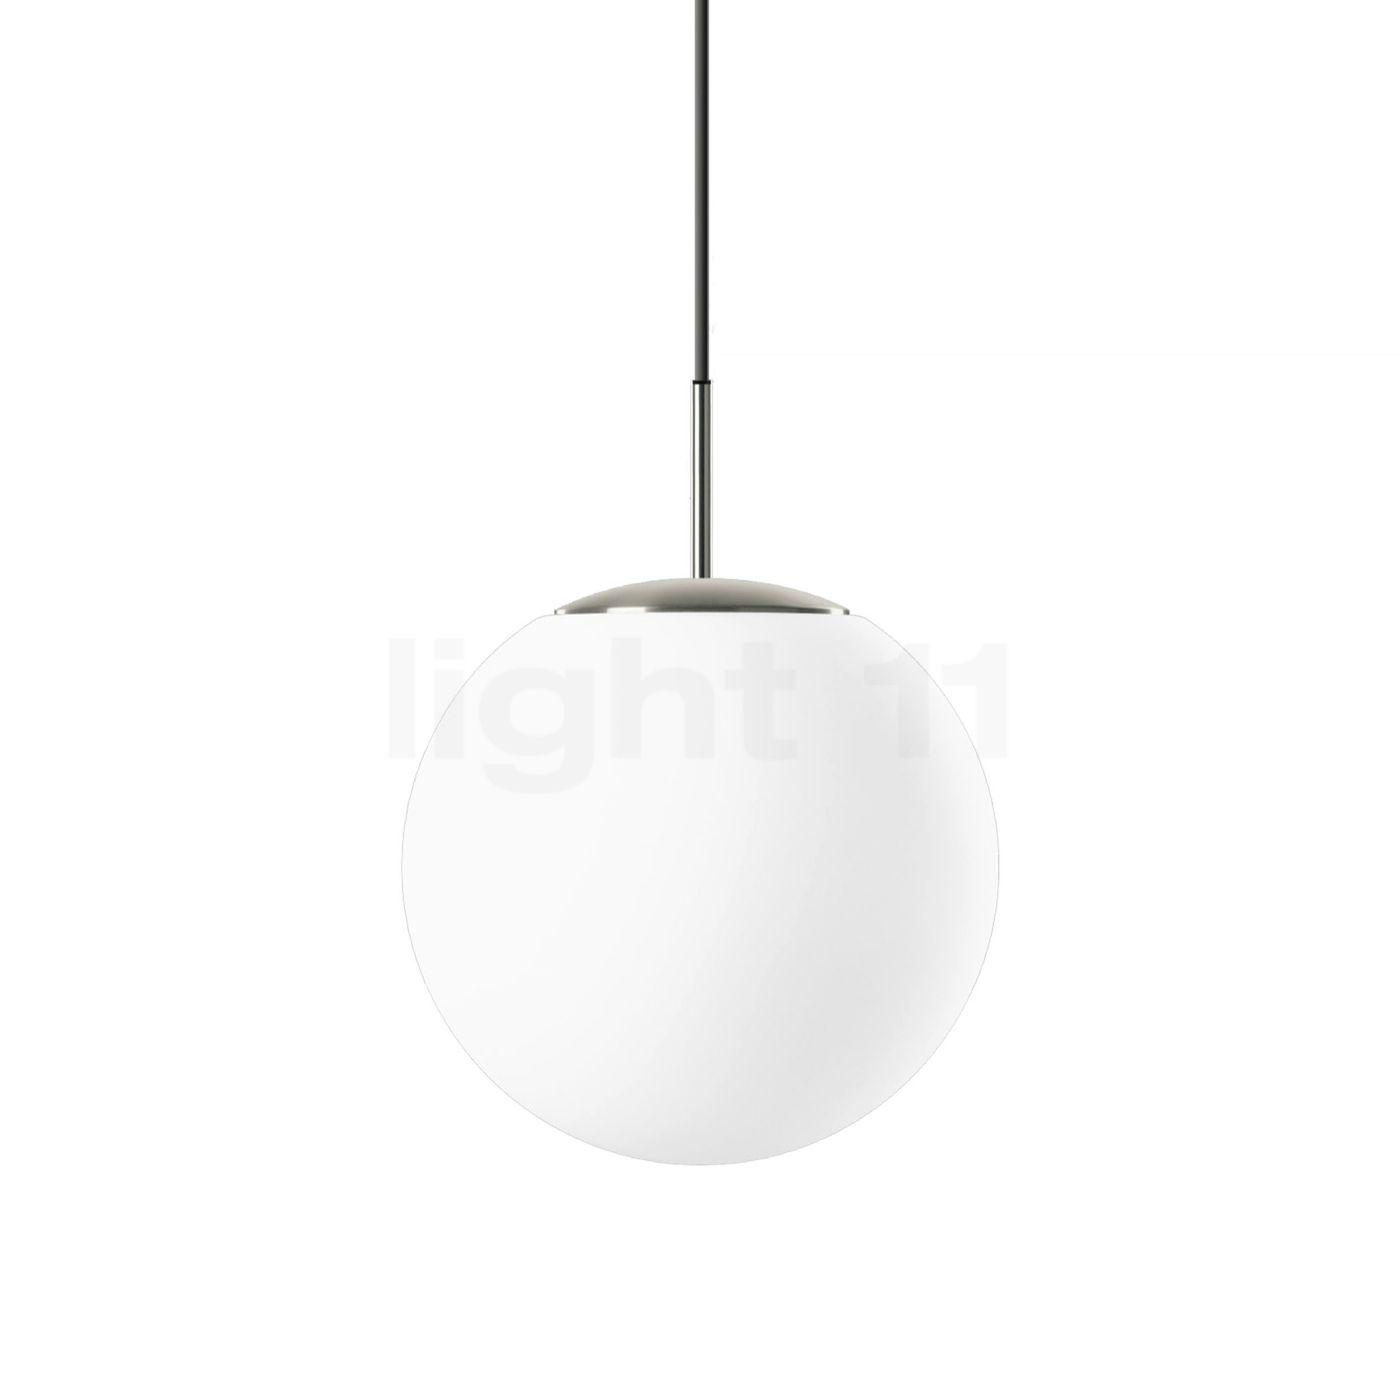 Bega 56591 - Pendelleuchte LED, Edelstahl 56591.2K3